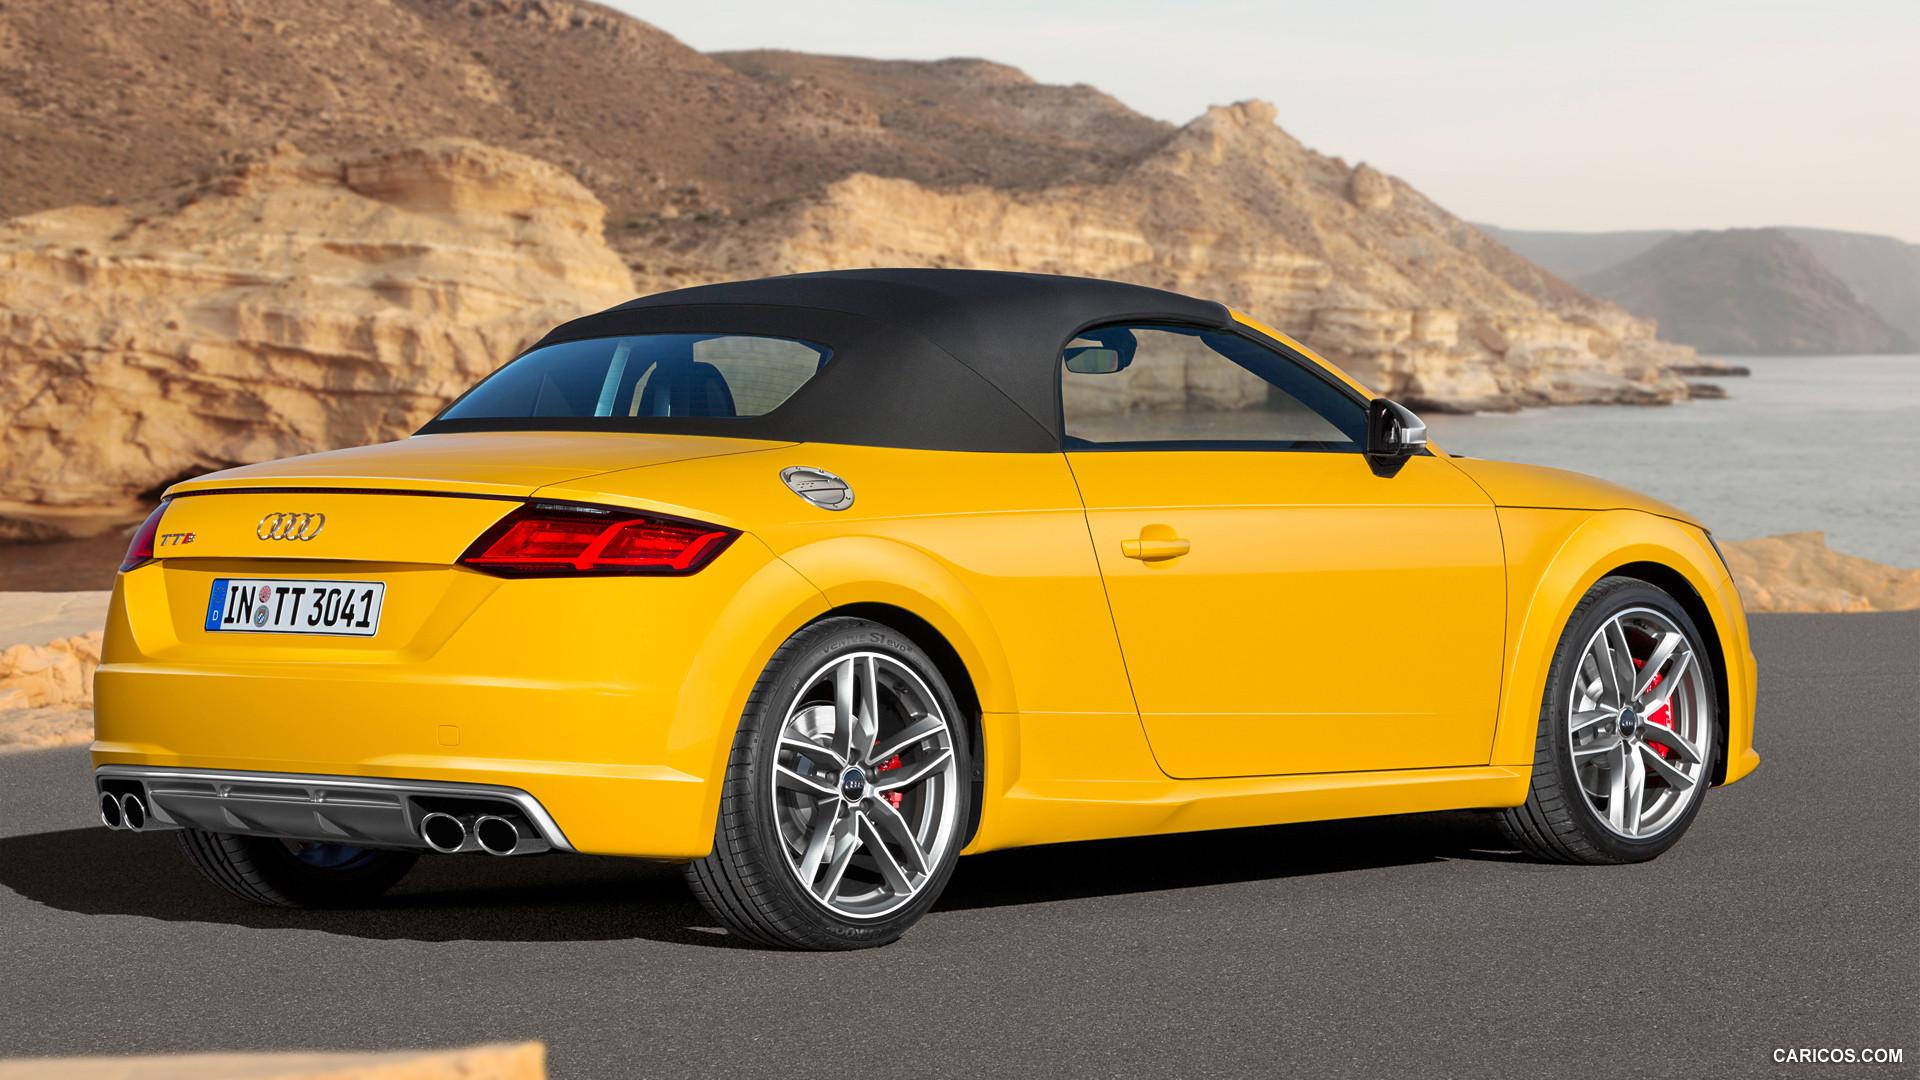 audi tt roadster yellow pc